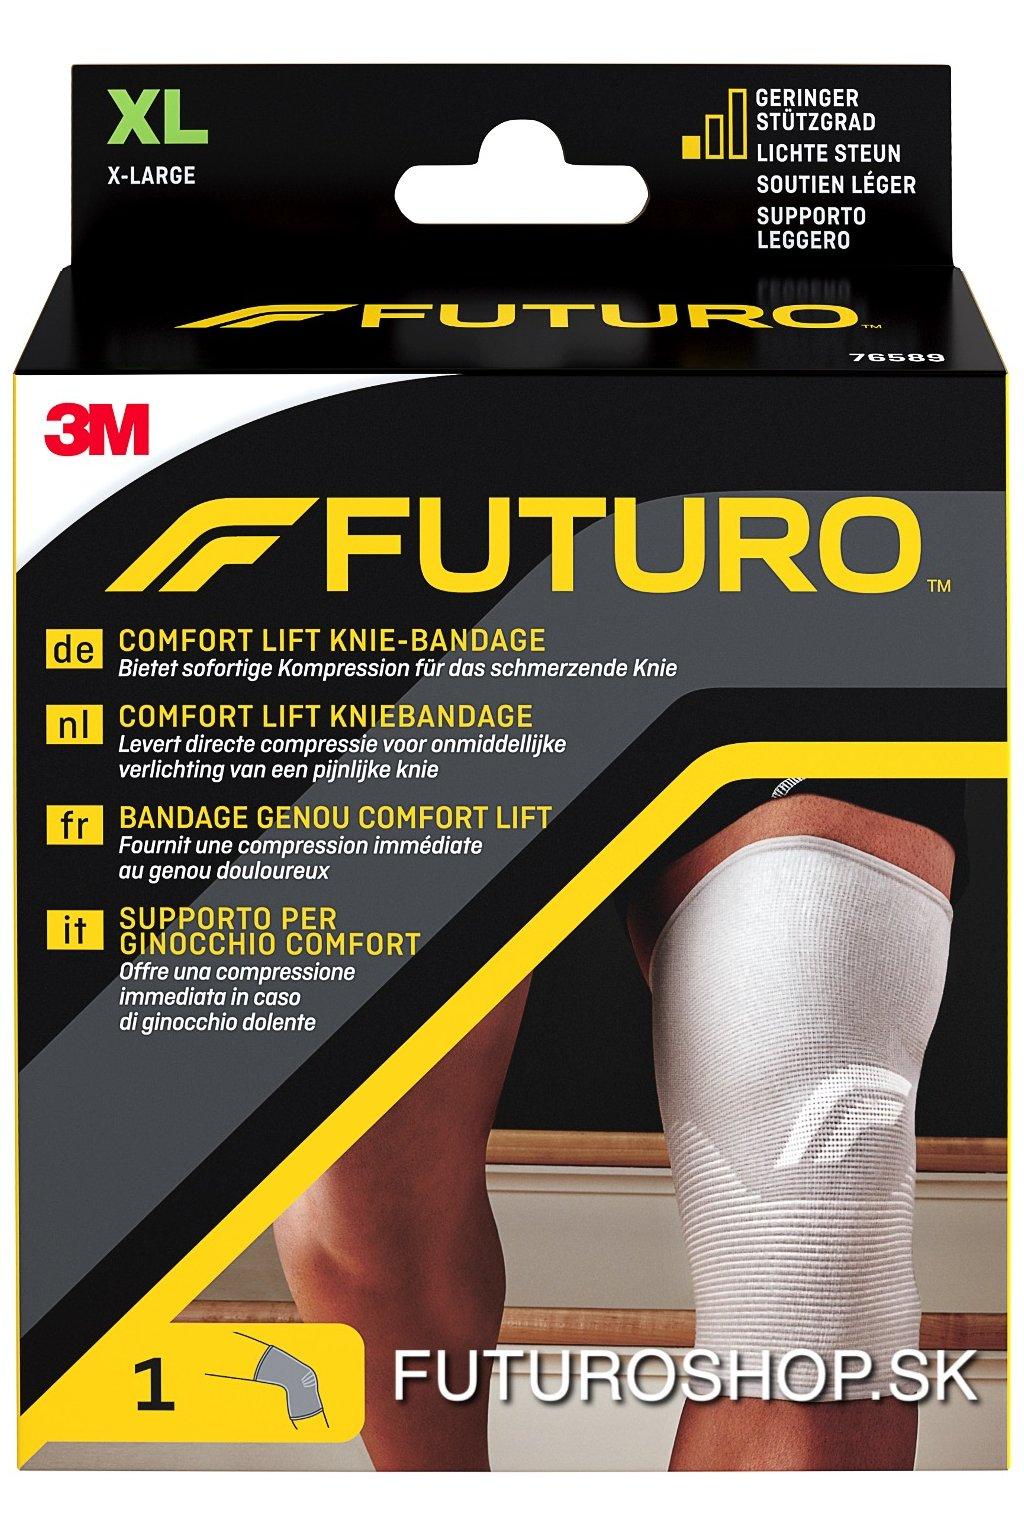 3M FUTURO kolenná bandáž Comfort Lift 76589, veľkosť XL